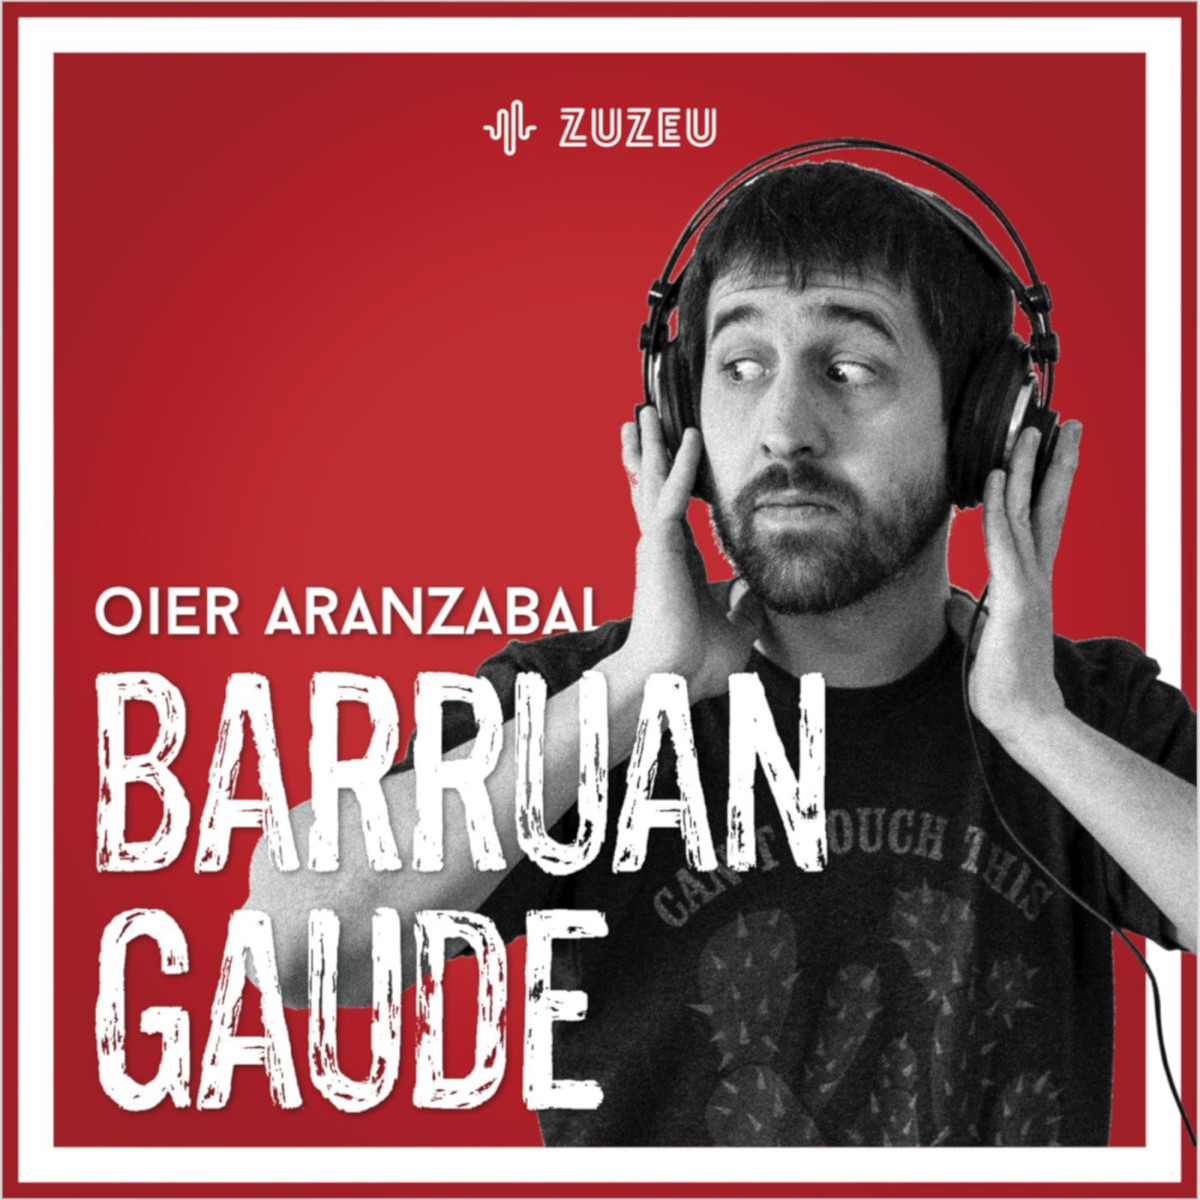 Barruan Gaude